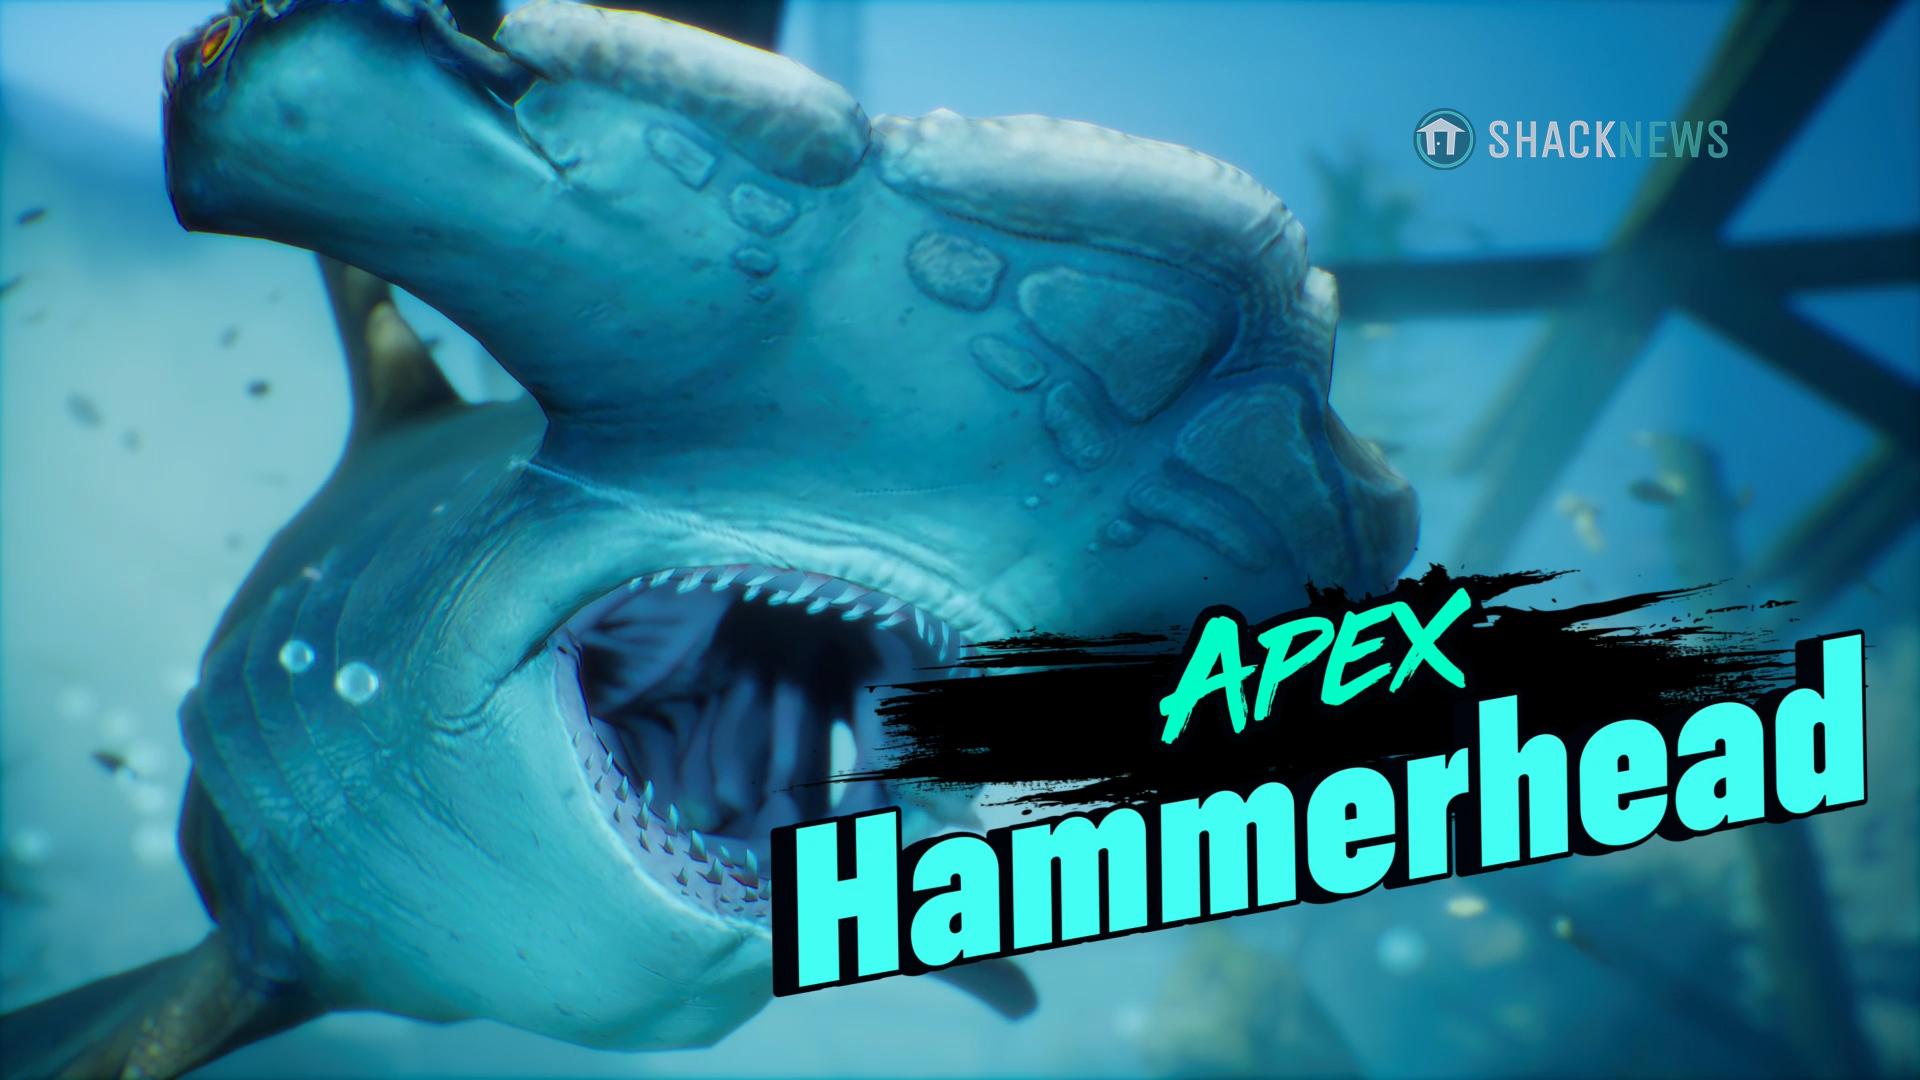 maneater apex predator hammerhead